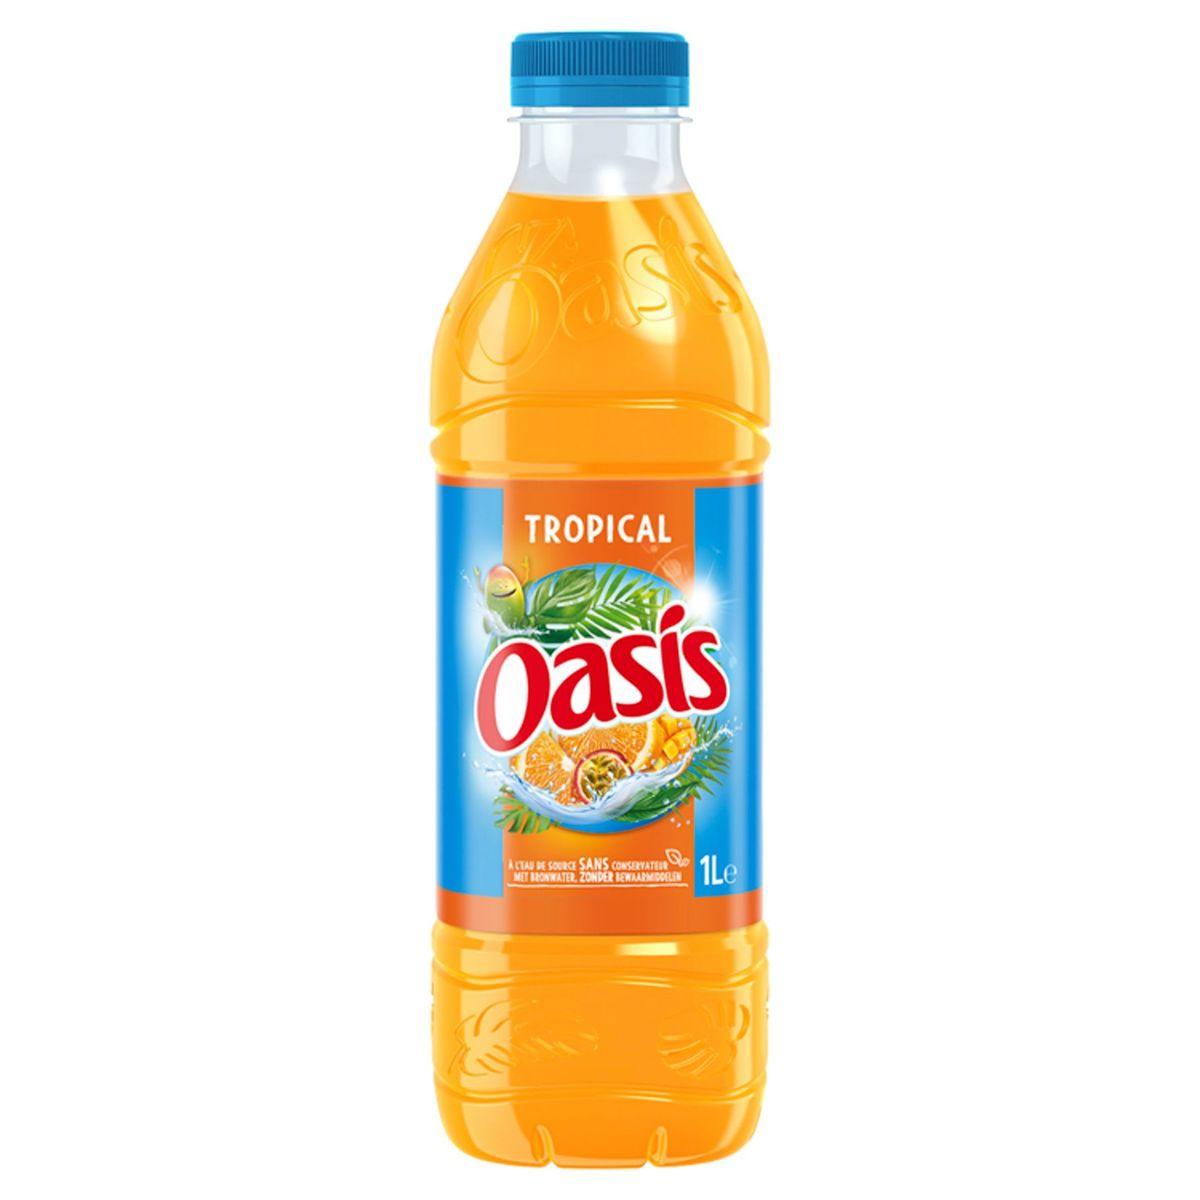 Oasis Tropical 1 L